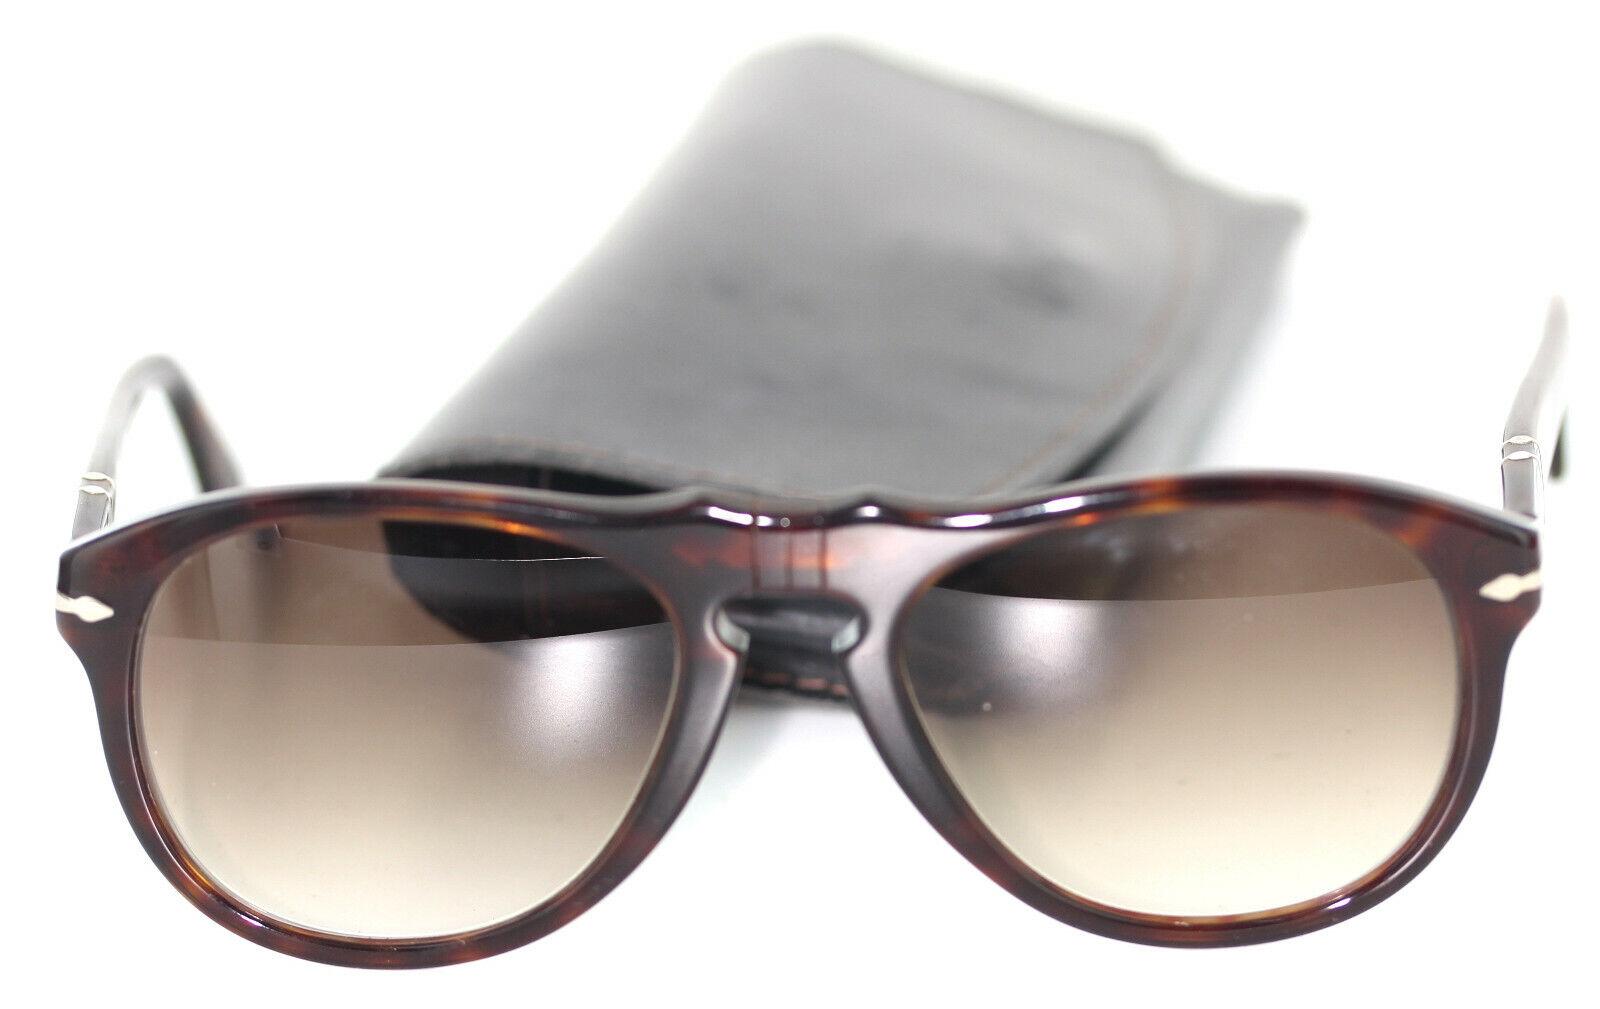 Persol 649 2451 Brille Sonnenbrille Braun (Havana) glasses prescription LENS